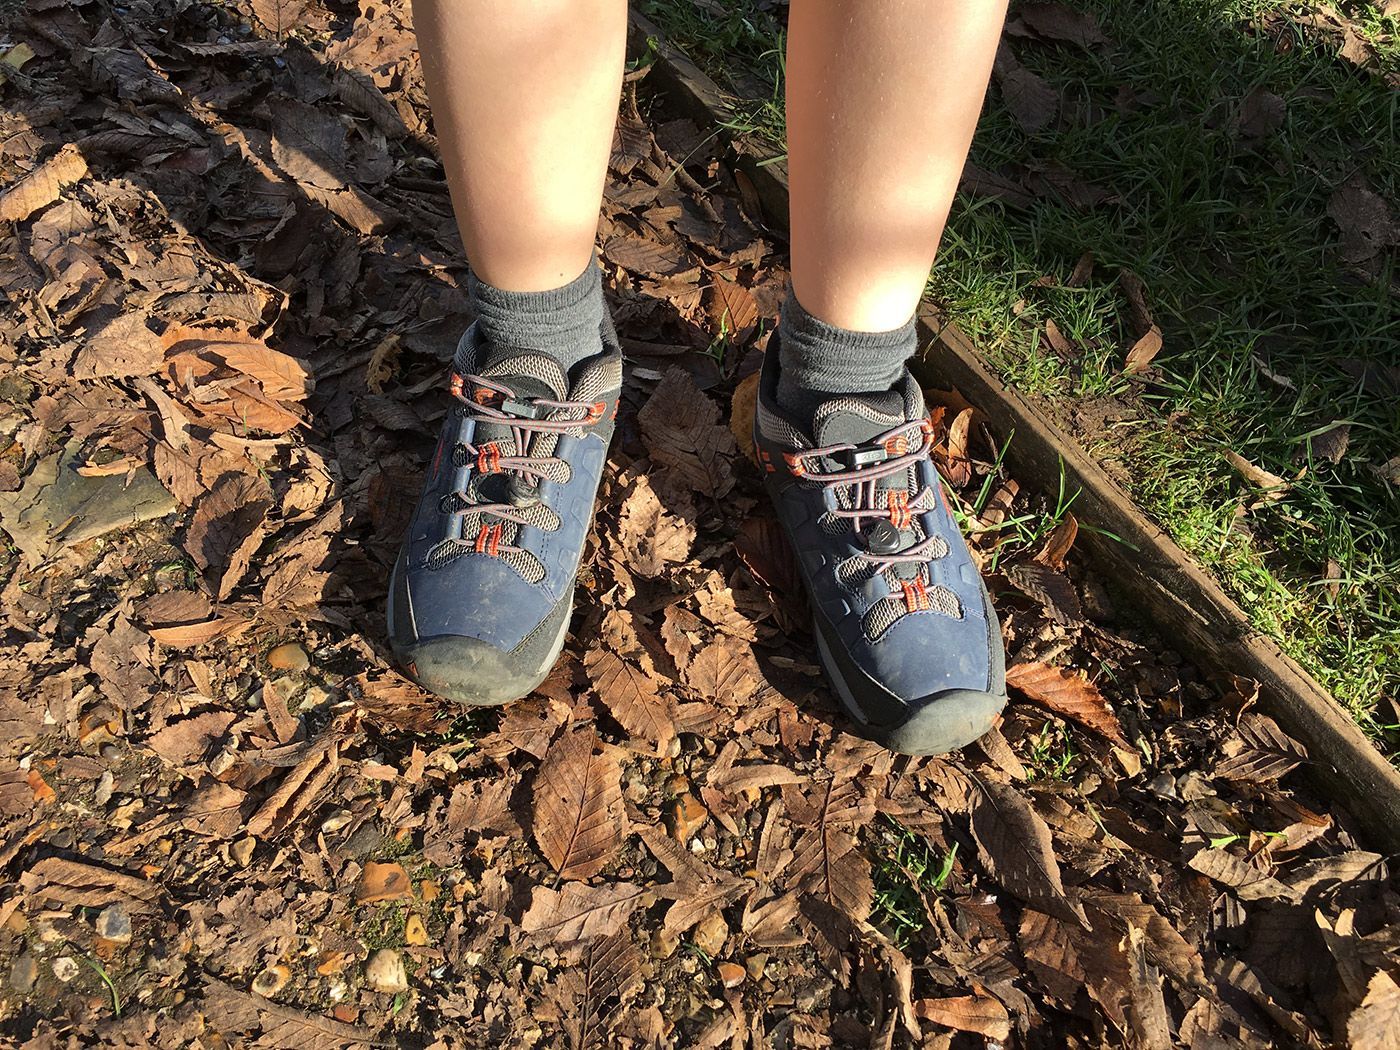 bde43b831f3 Keen Older Kids'Targhee Waterproof Hiking Shoes | CWS ⛺ Field Test ...